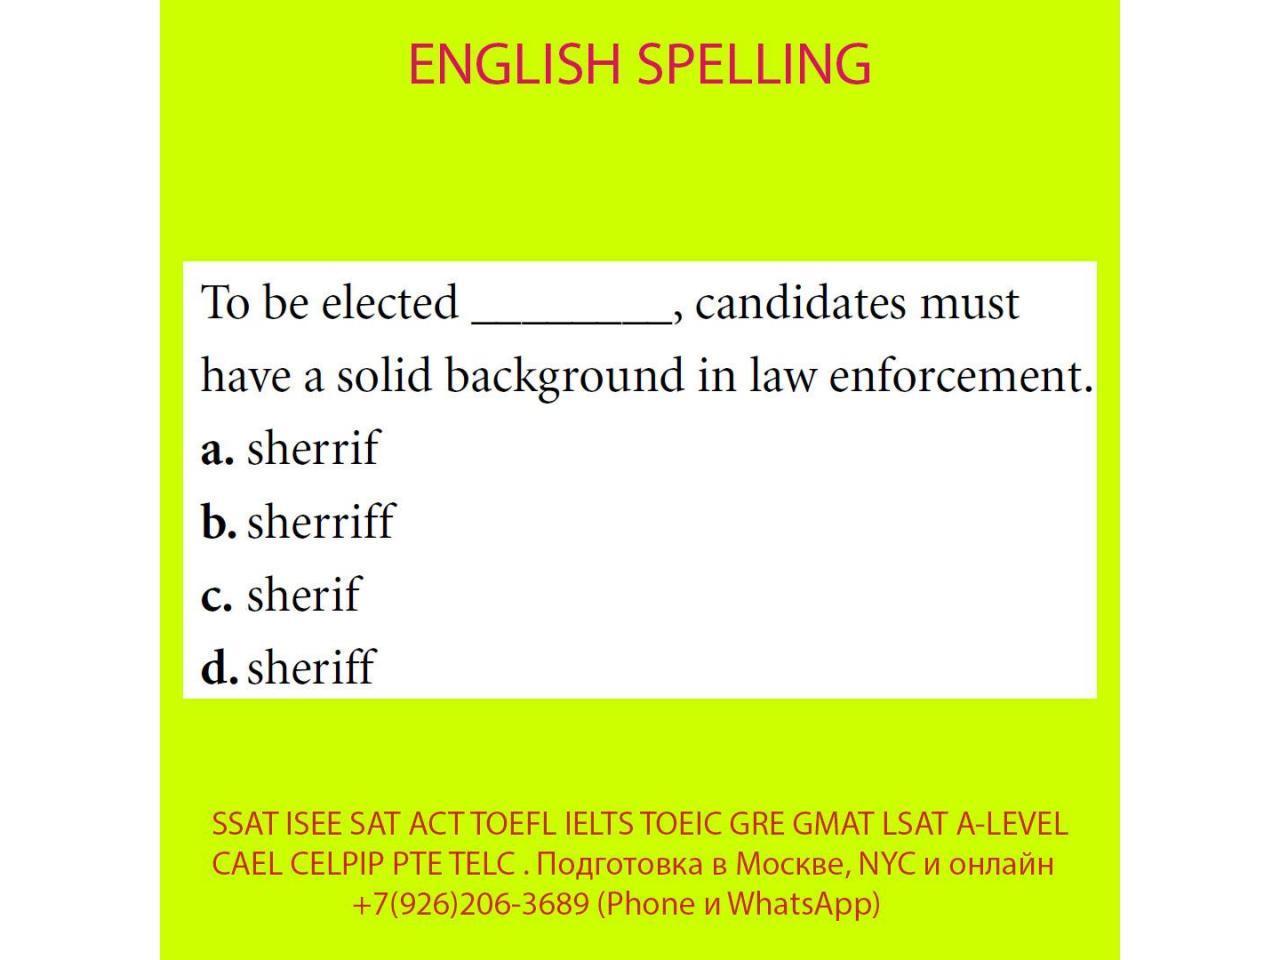 Подготовка к SSAT ISEE SAT ACT TOEFL IELTS TOEIC GRE GMAT LSAT A-LEVEL BEC CAEL CELPIP PTE TELC - 5